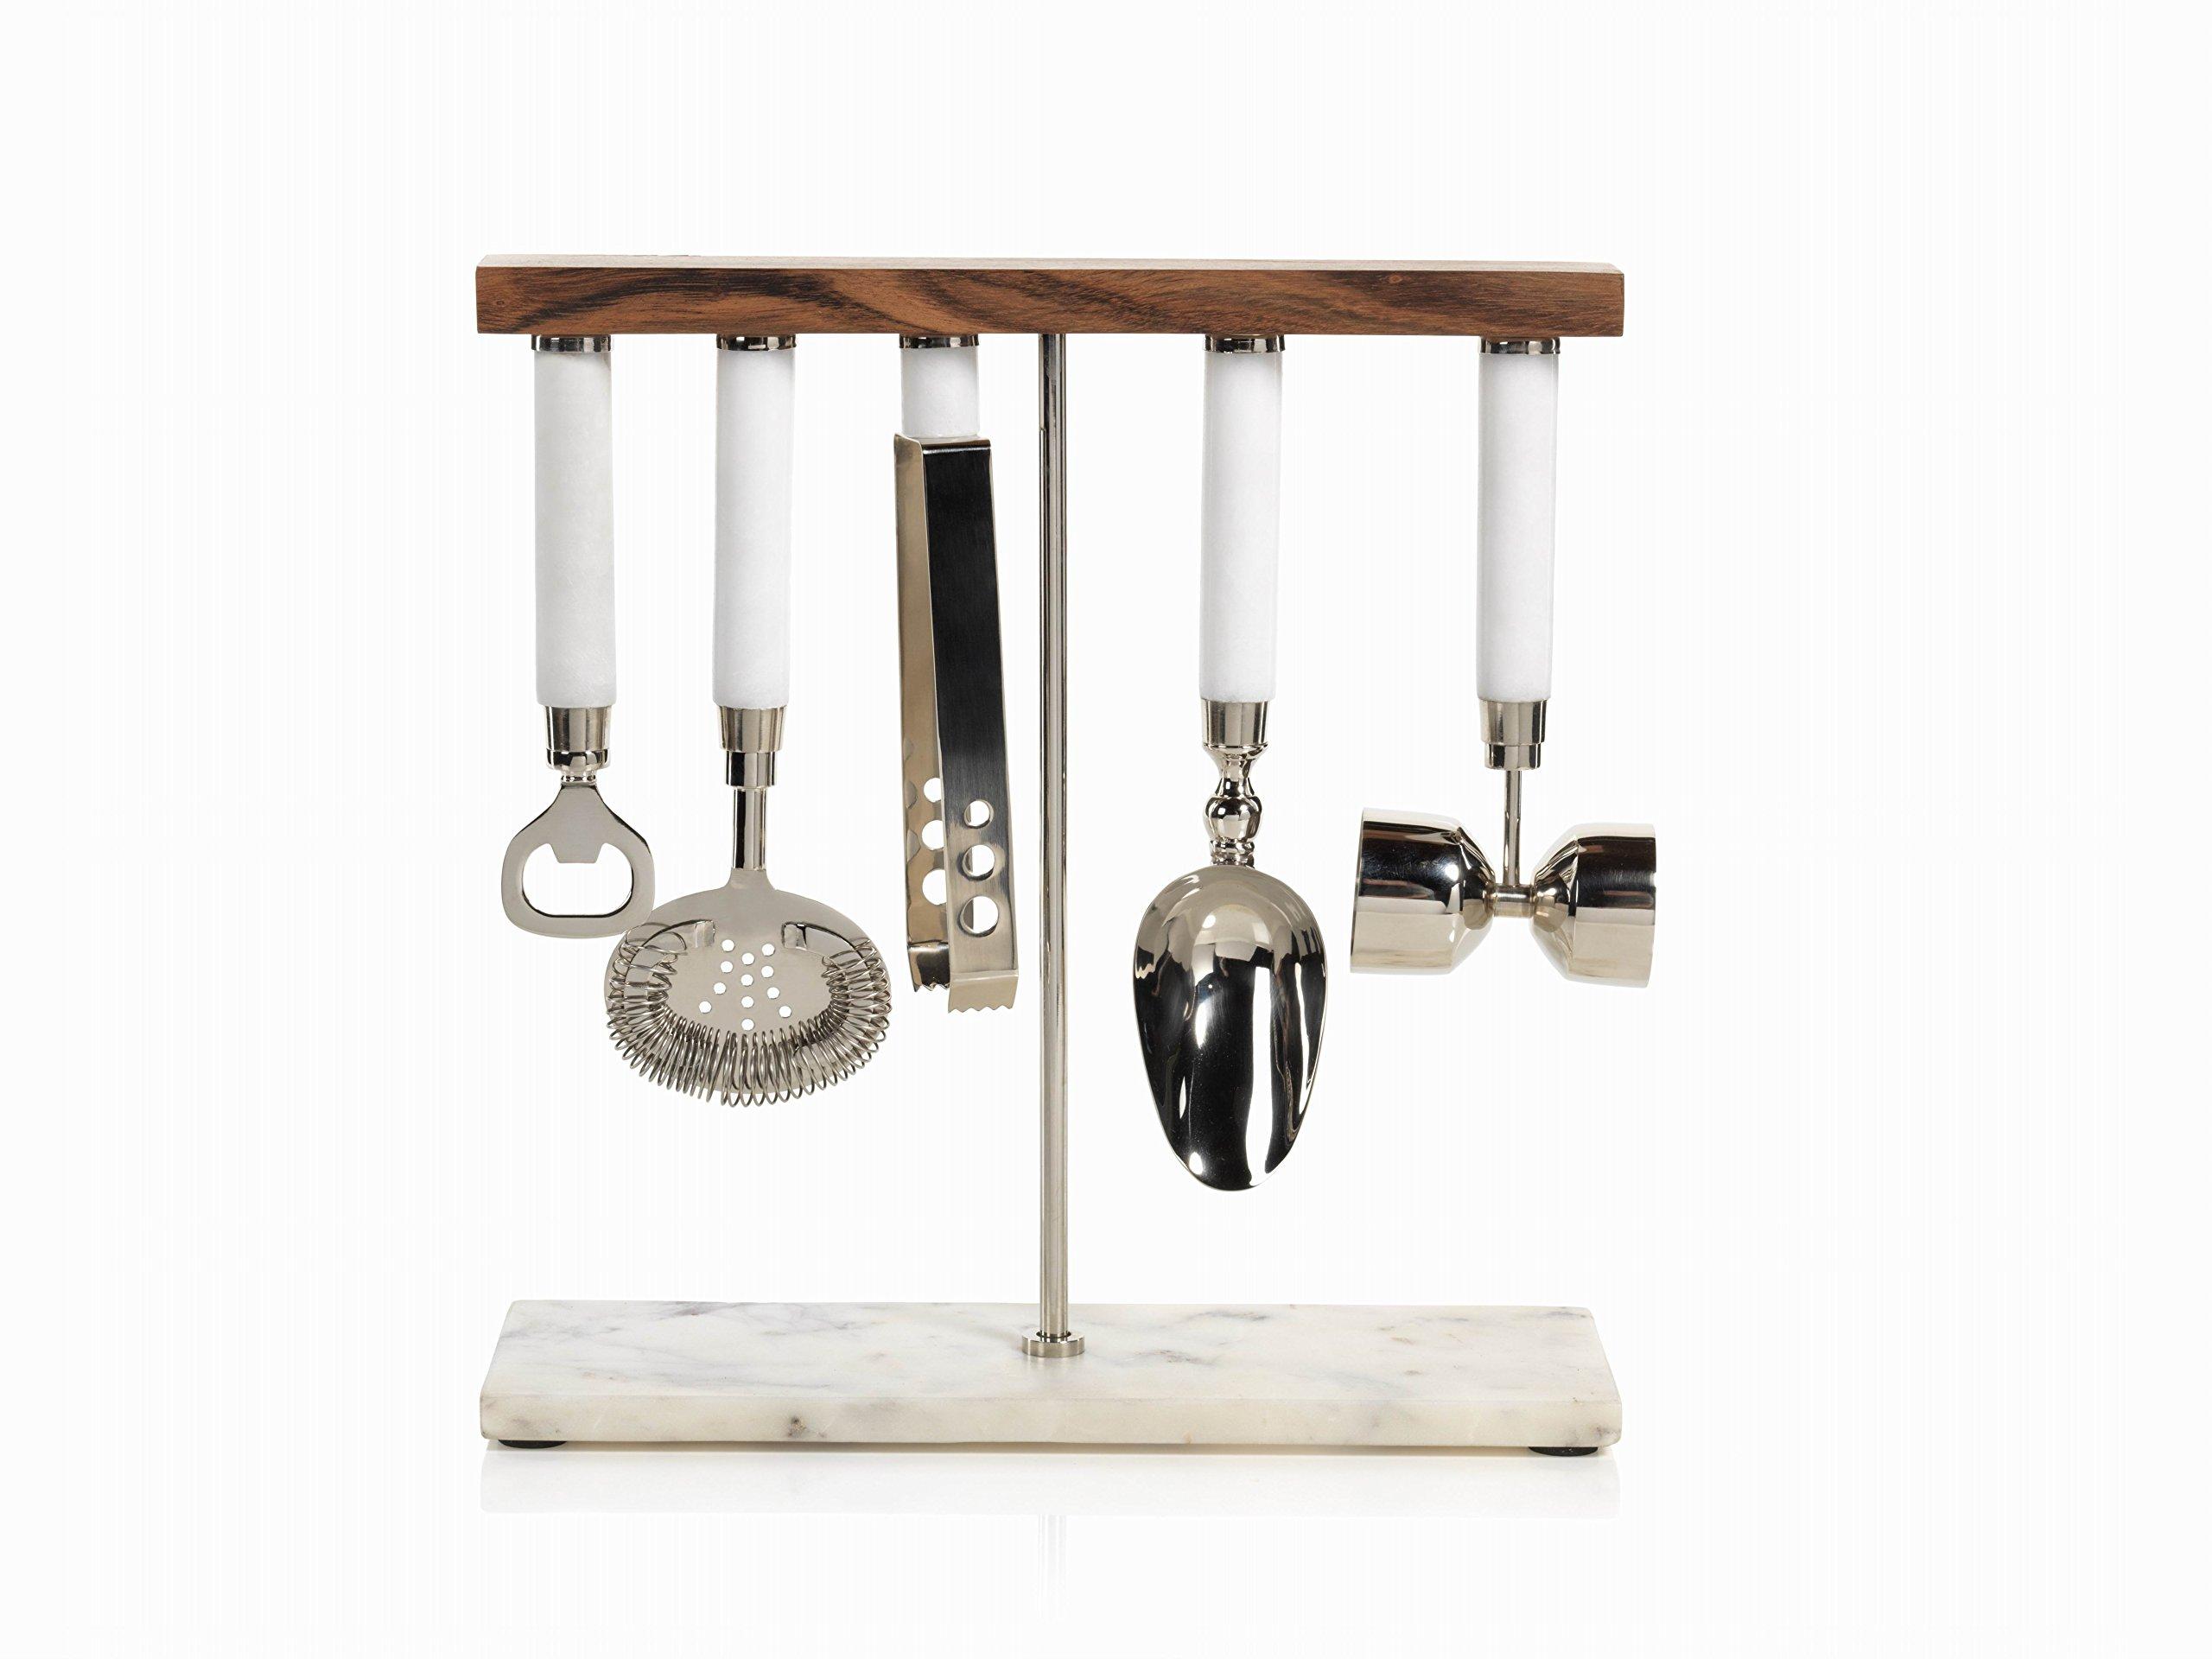 Zodax Marbella 5-Piece Bar Tool Set, 5